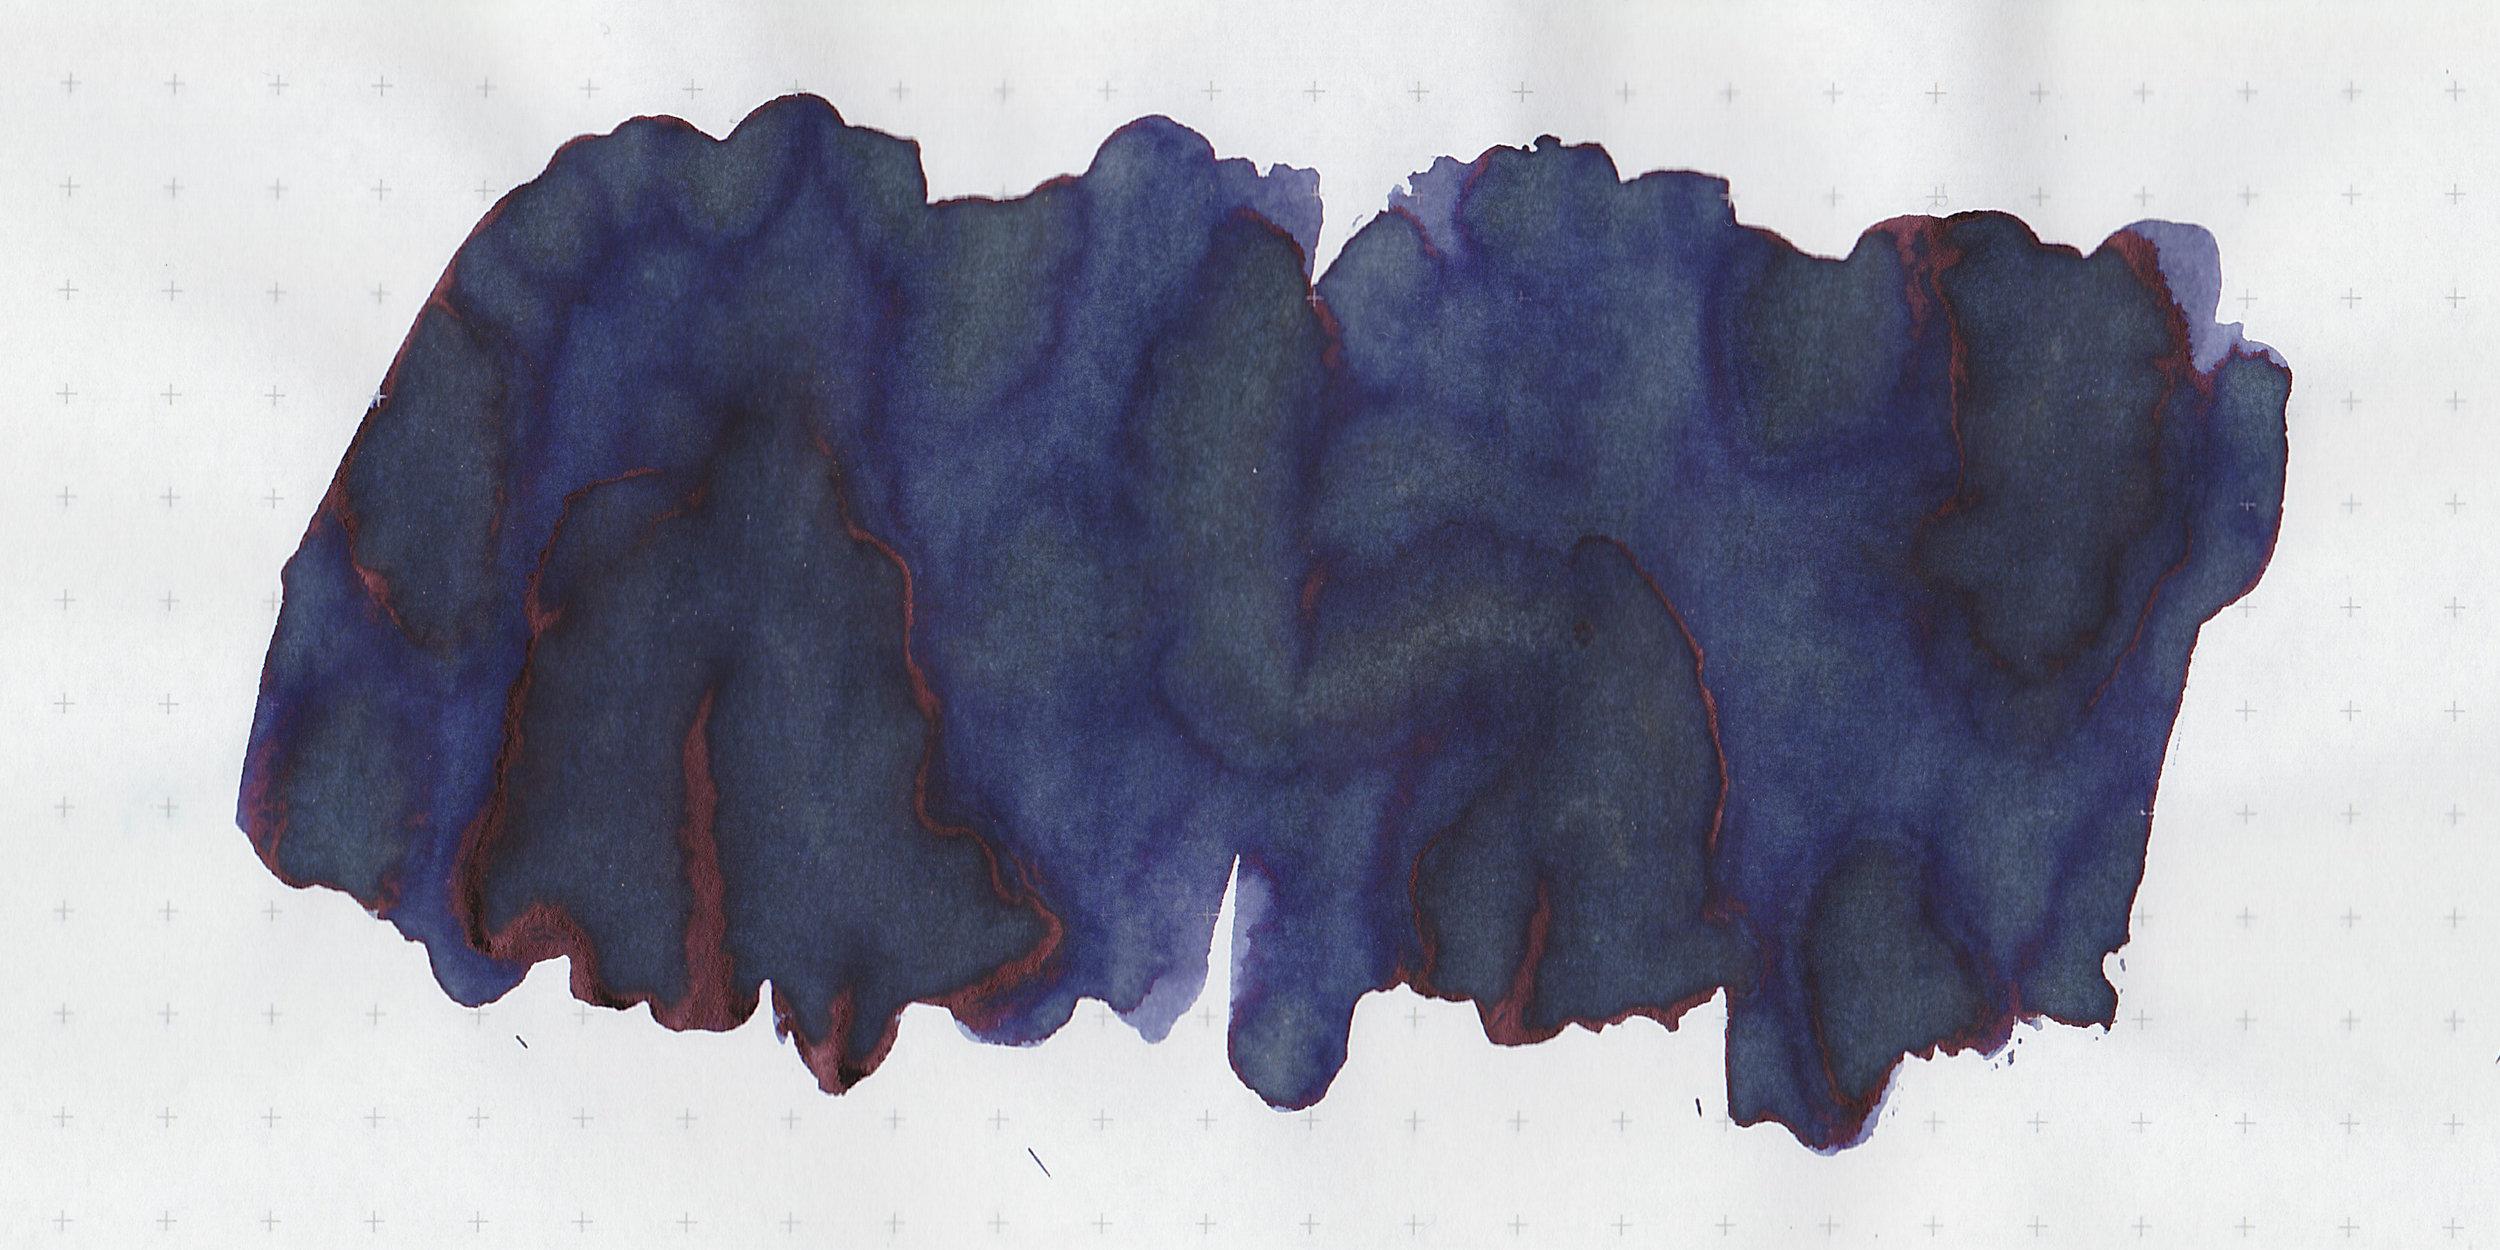 nemo-pleiades-blue-black-3.jpg